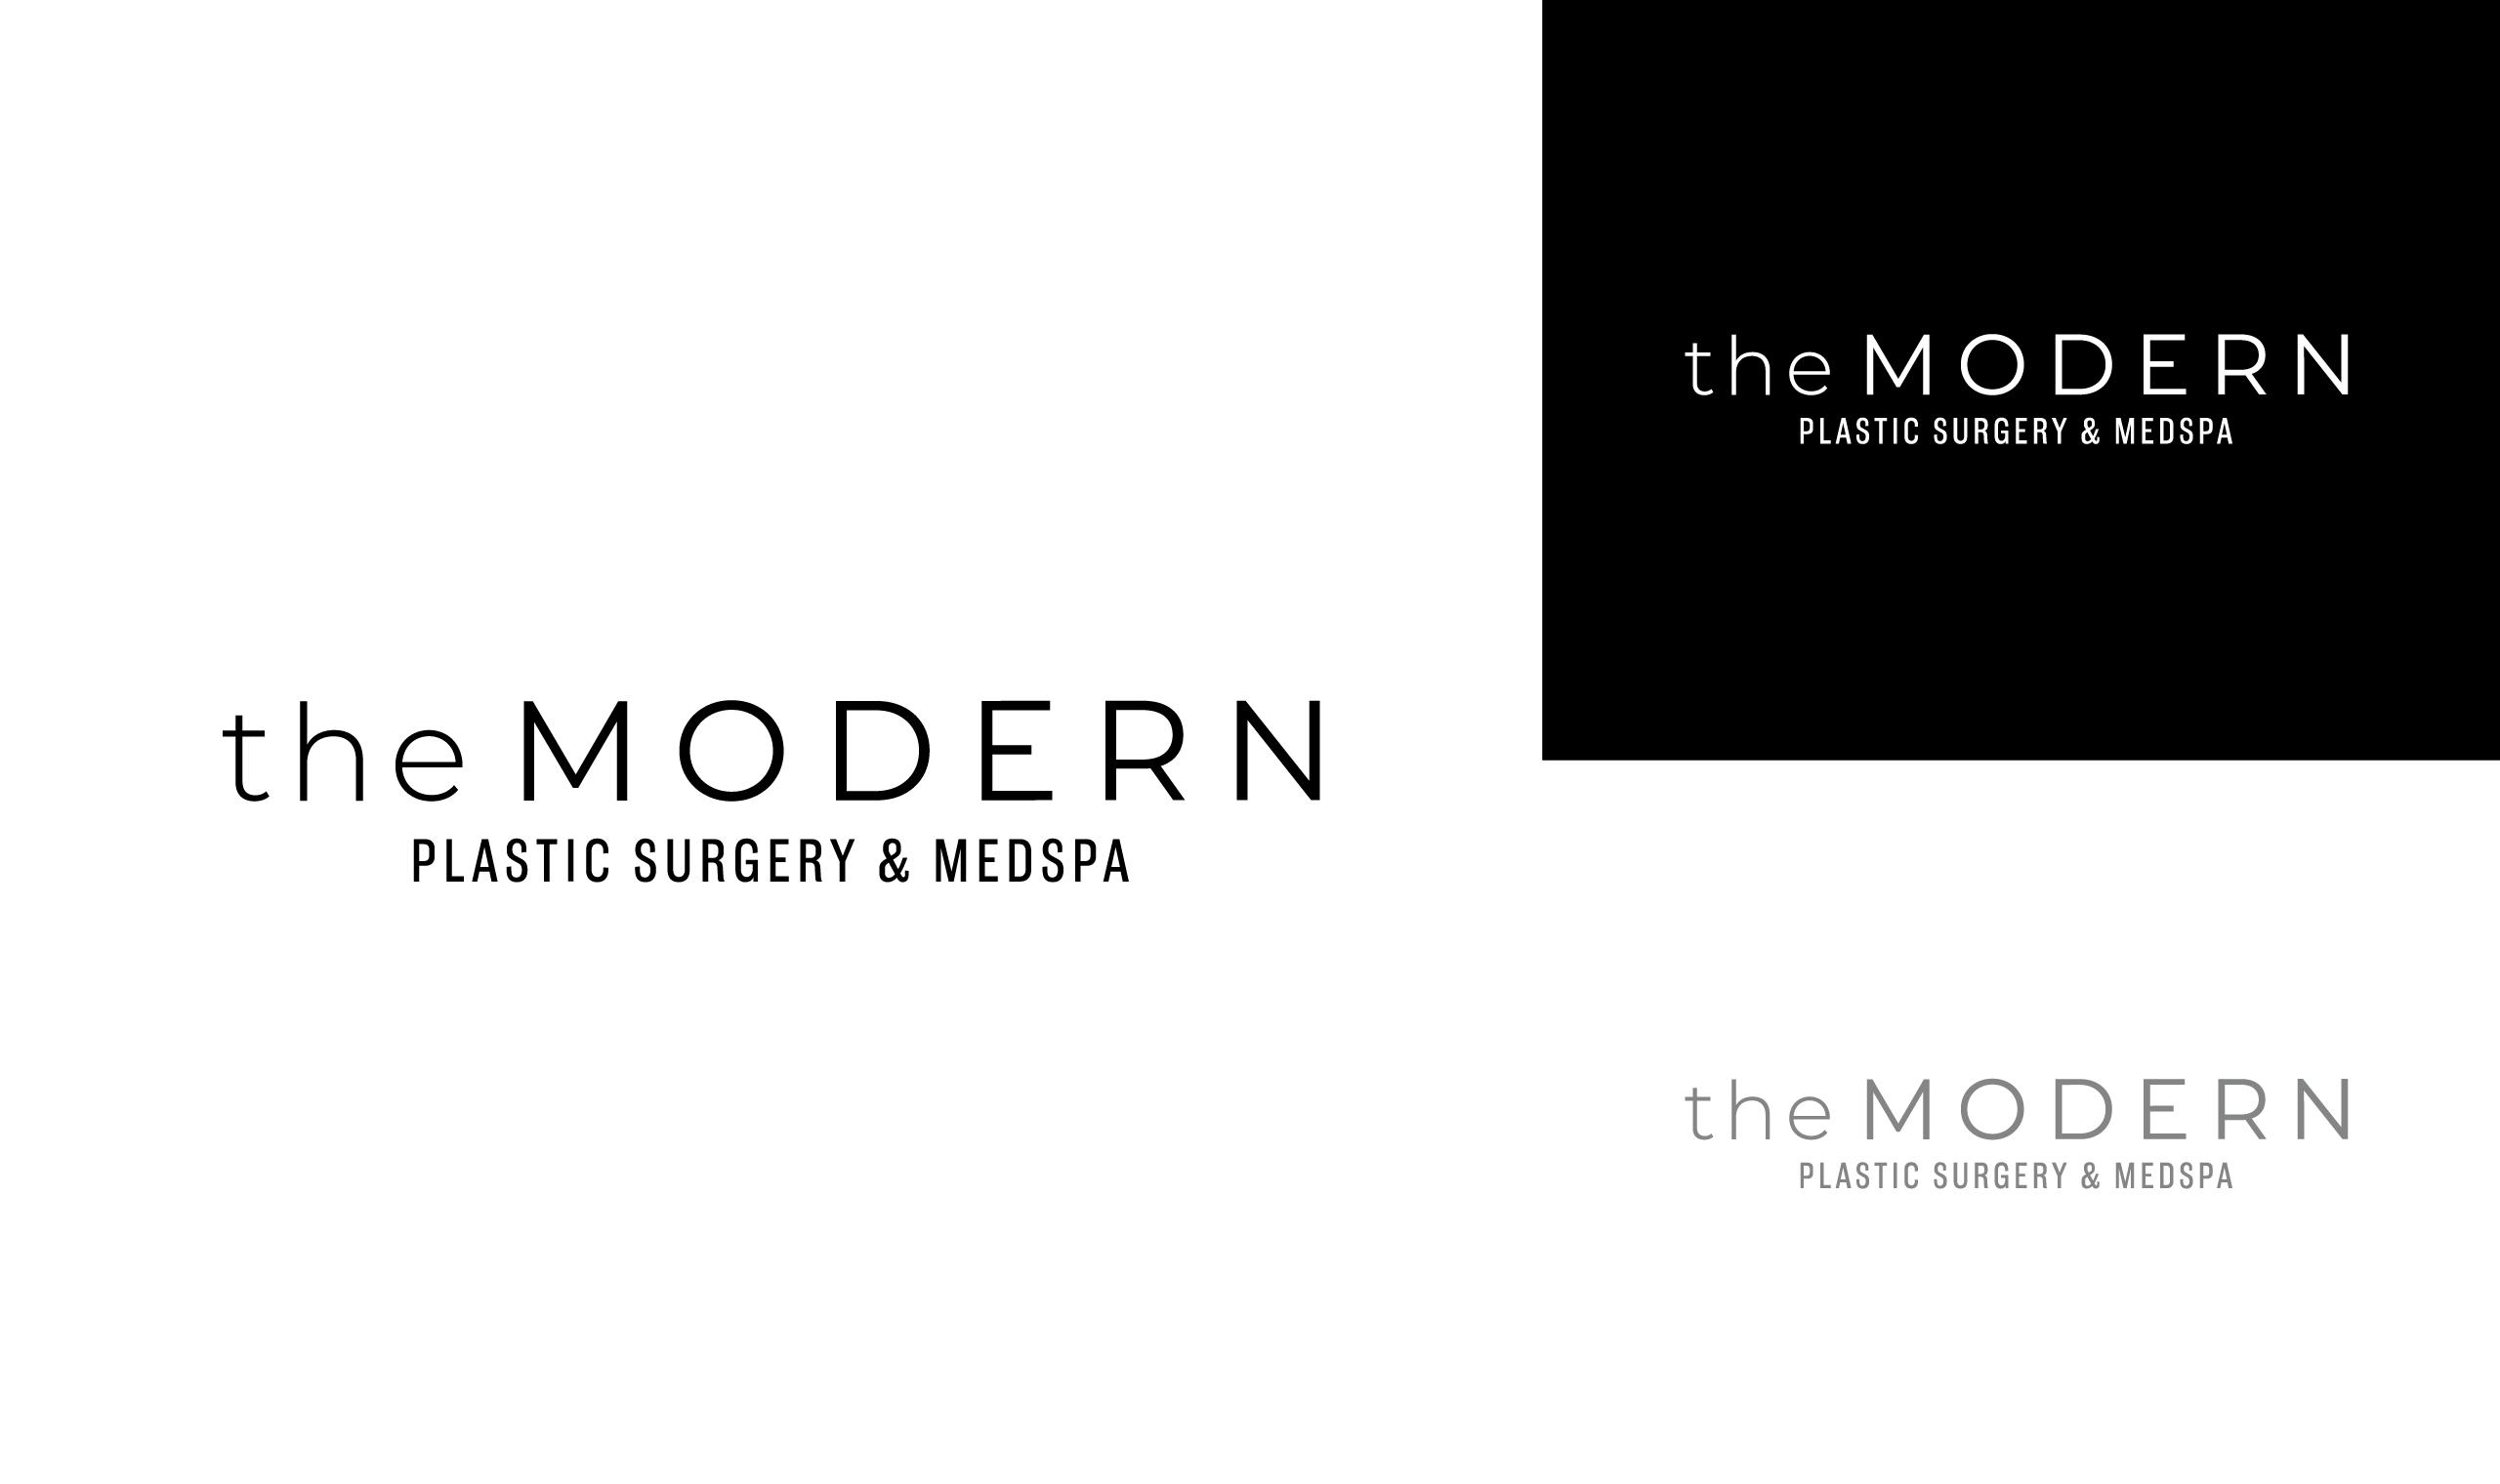 theMODERN